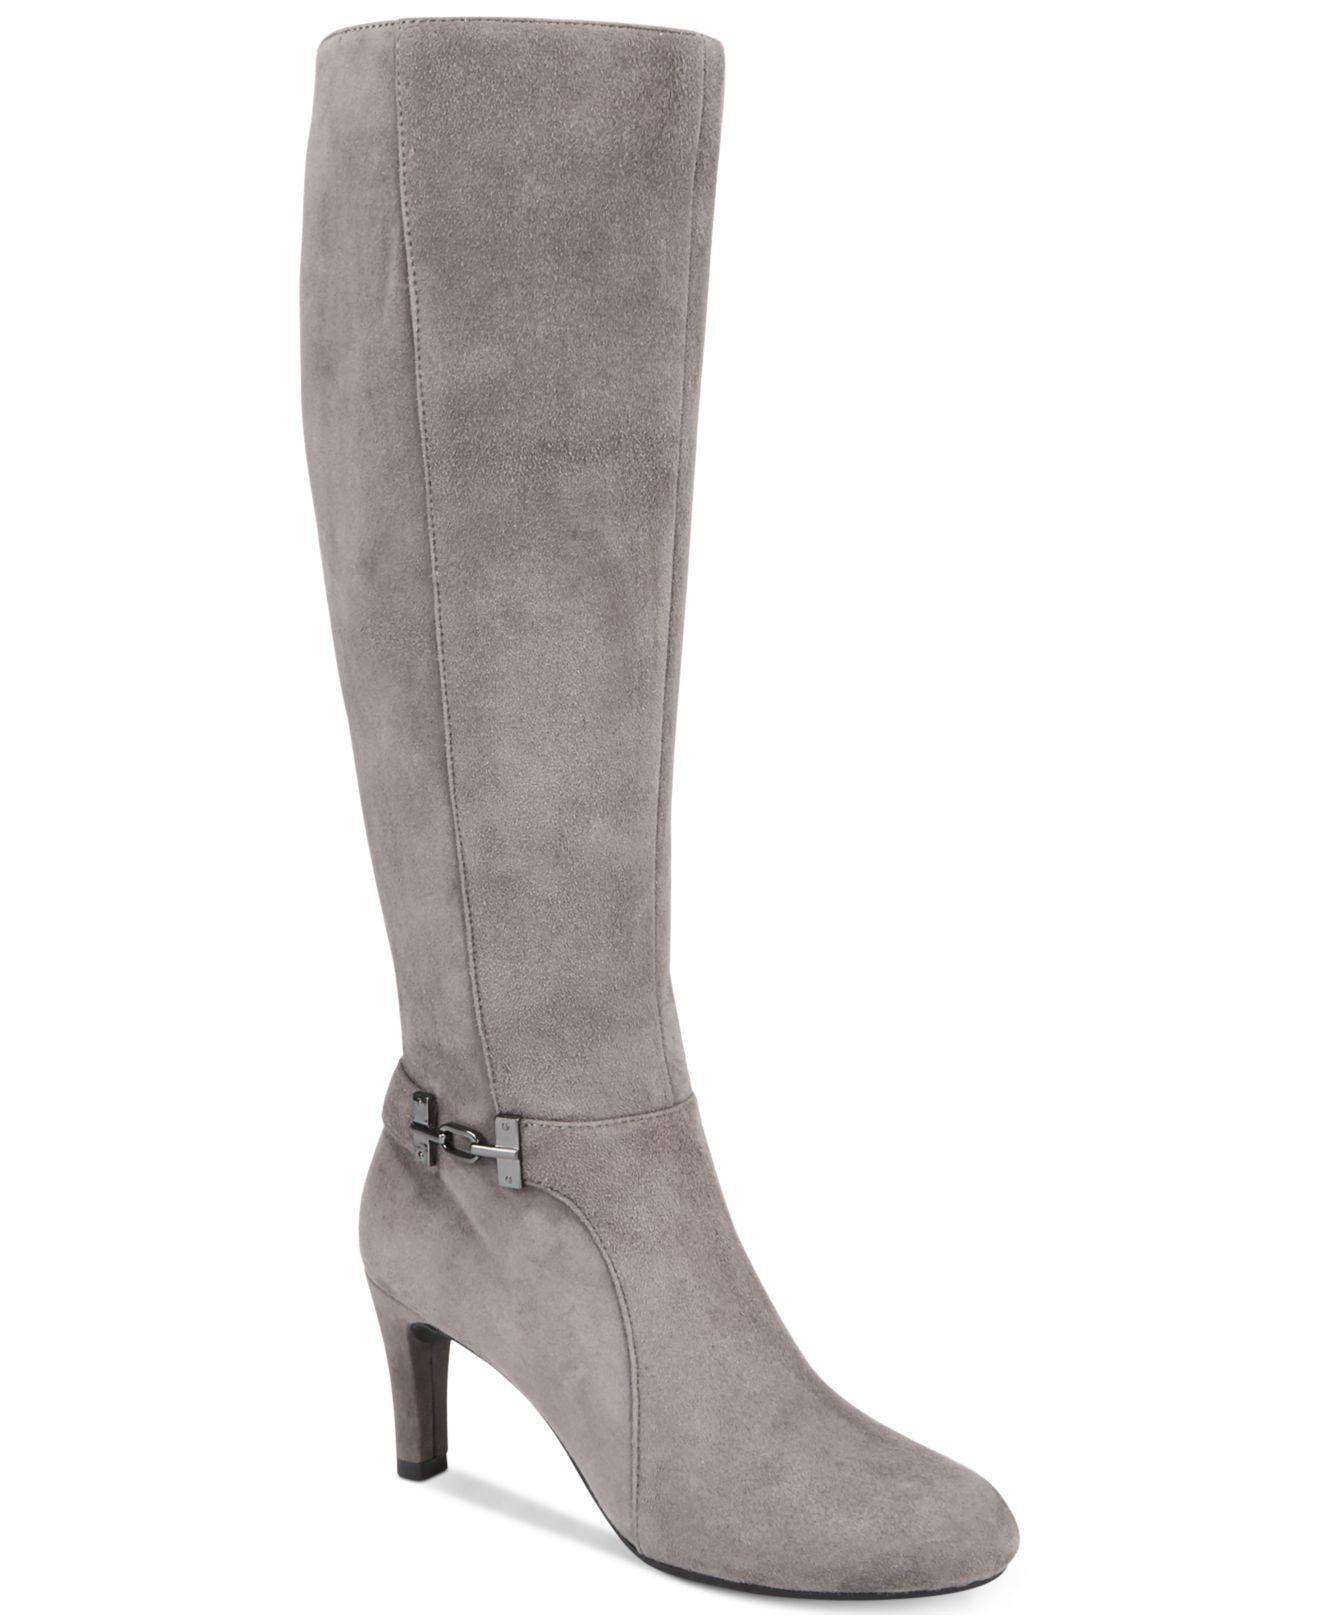 447cd3c6c49 Lyst - Bandolino Lamari Wide-calf Dress Boots in Gray